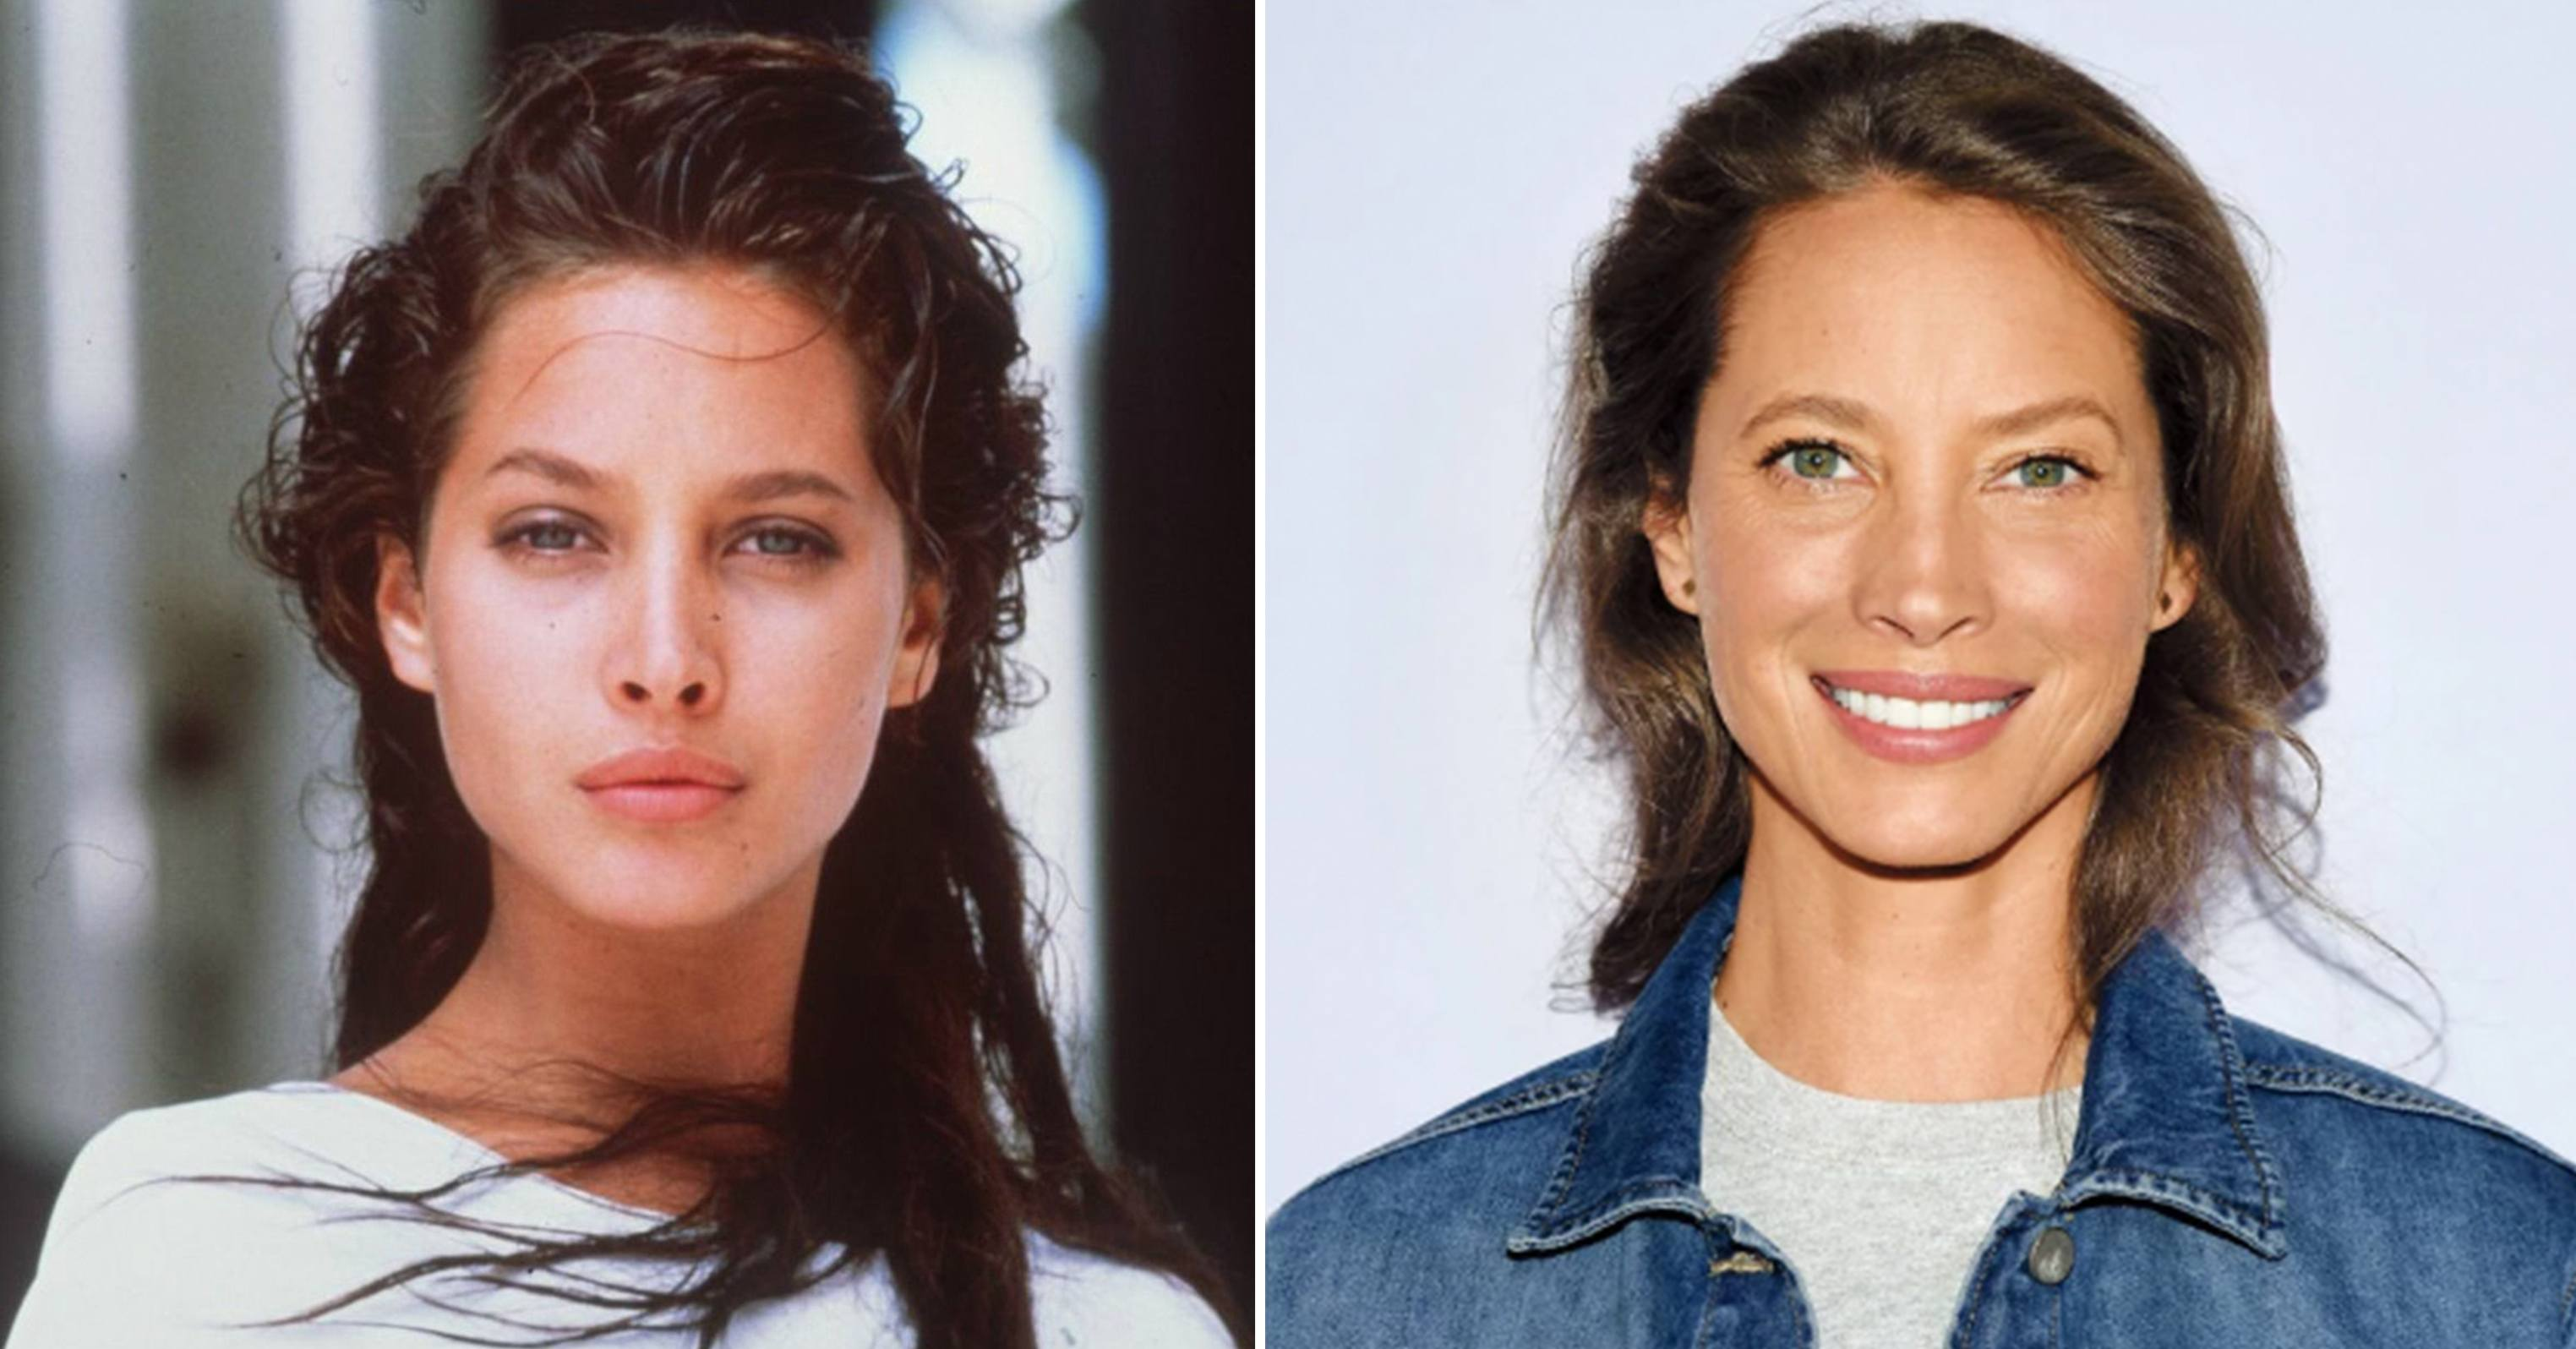 1980s models